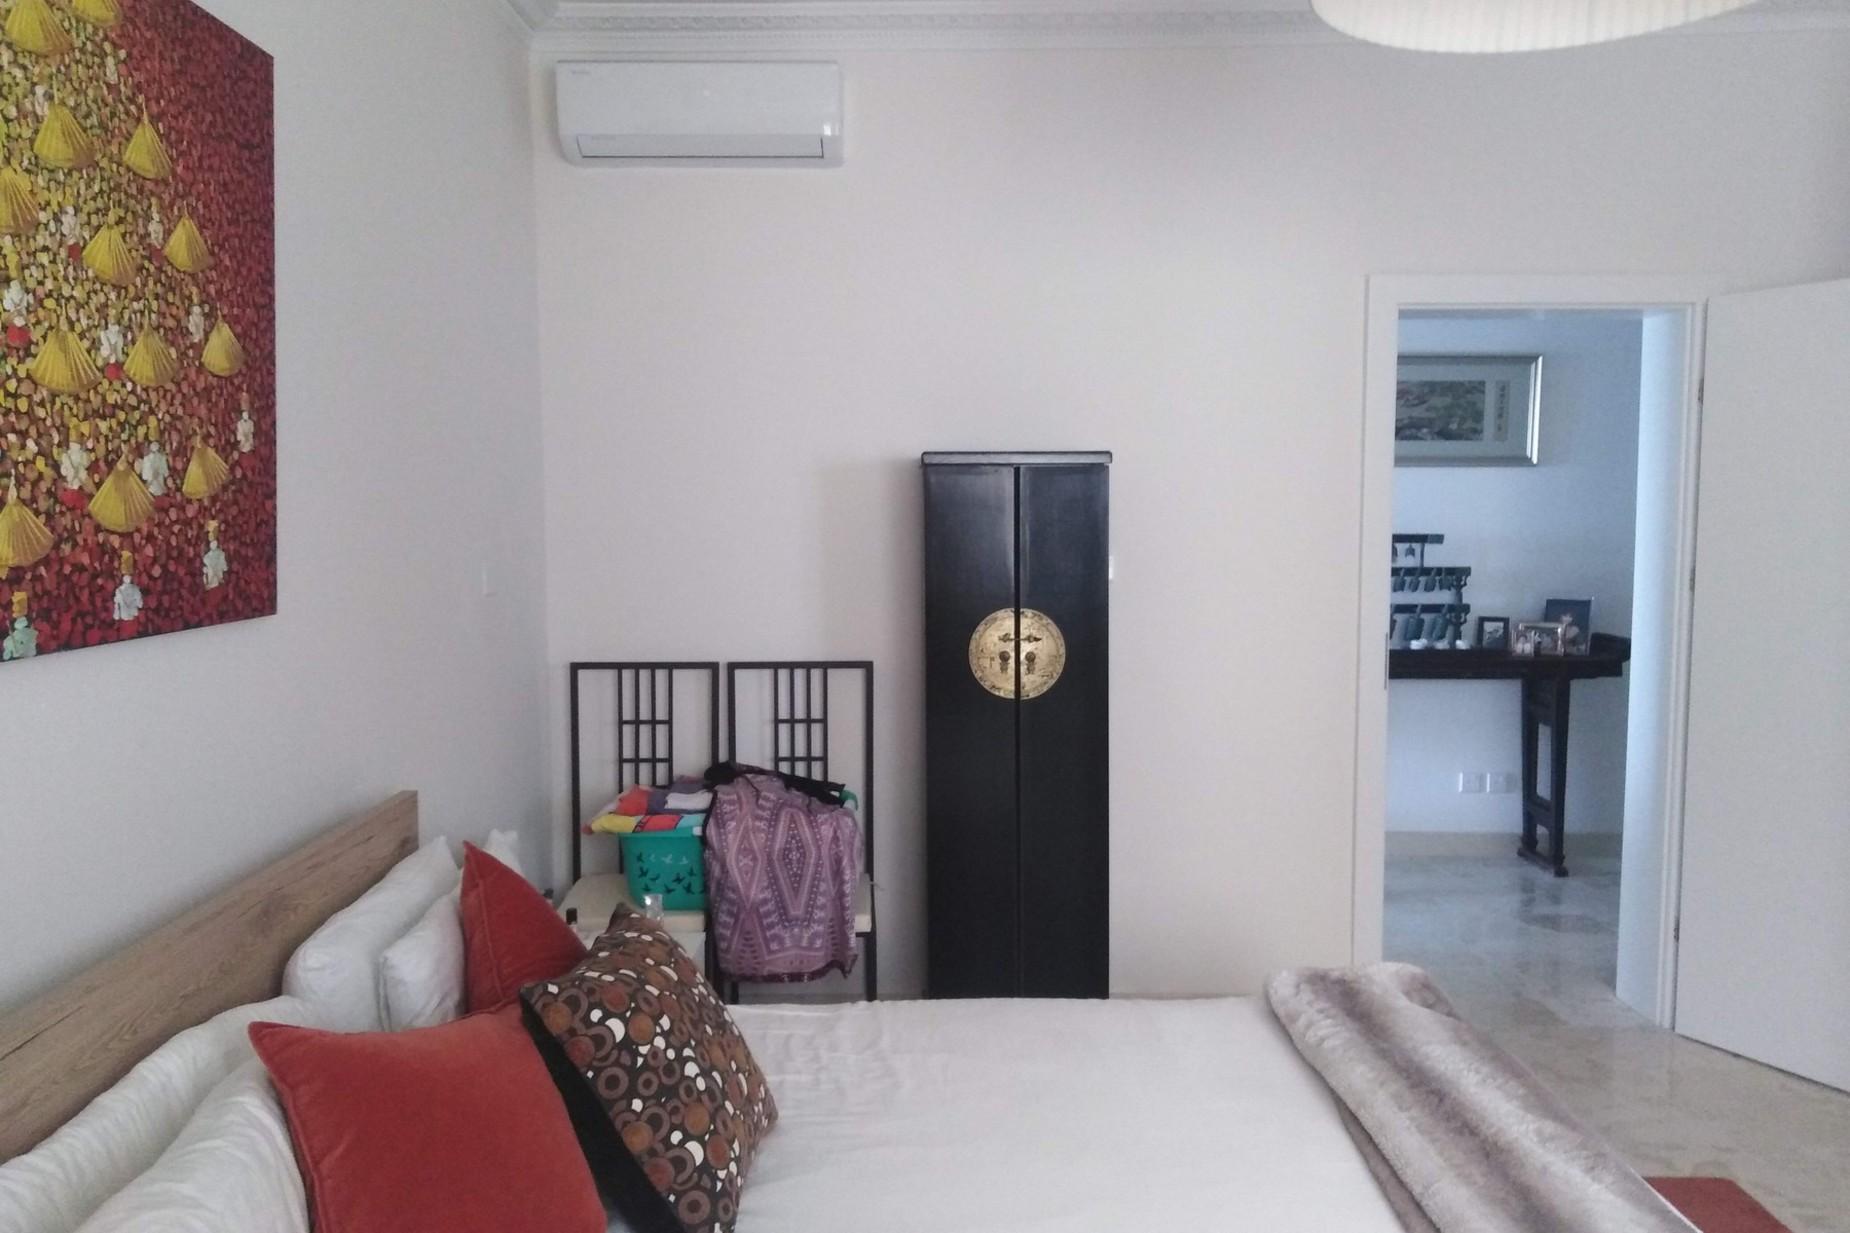 4 bed Apartment For Rent in Sliema, Sliema - thumb 9